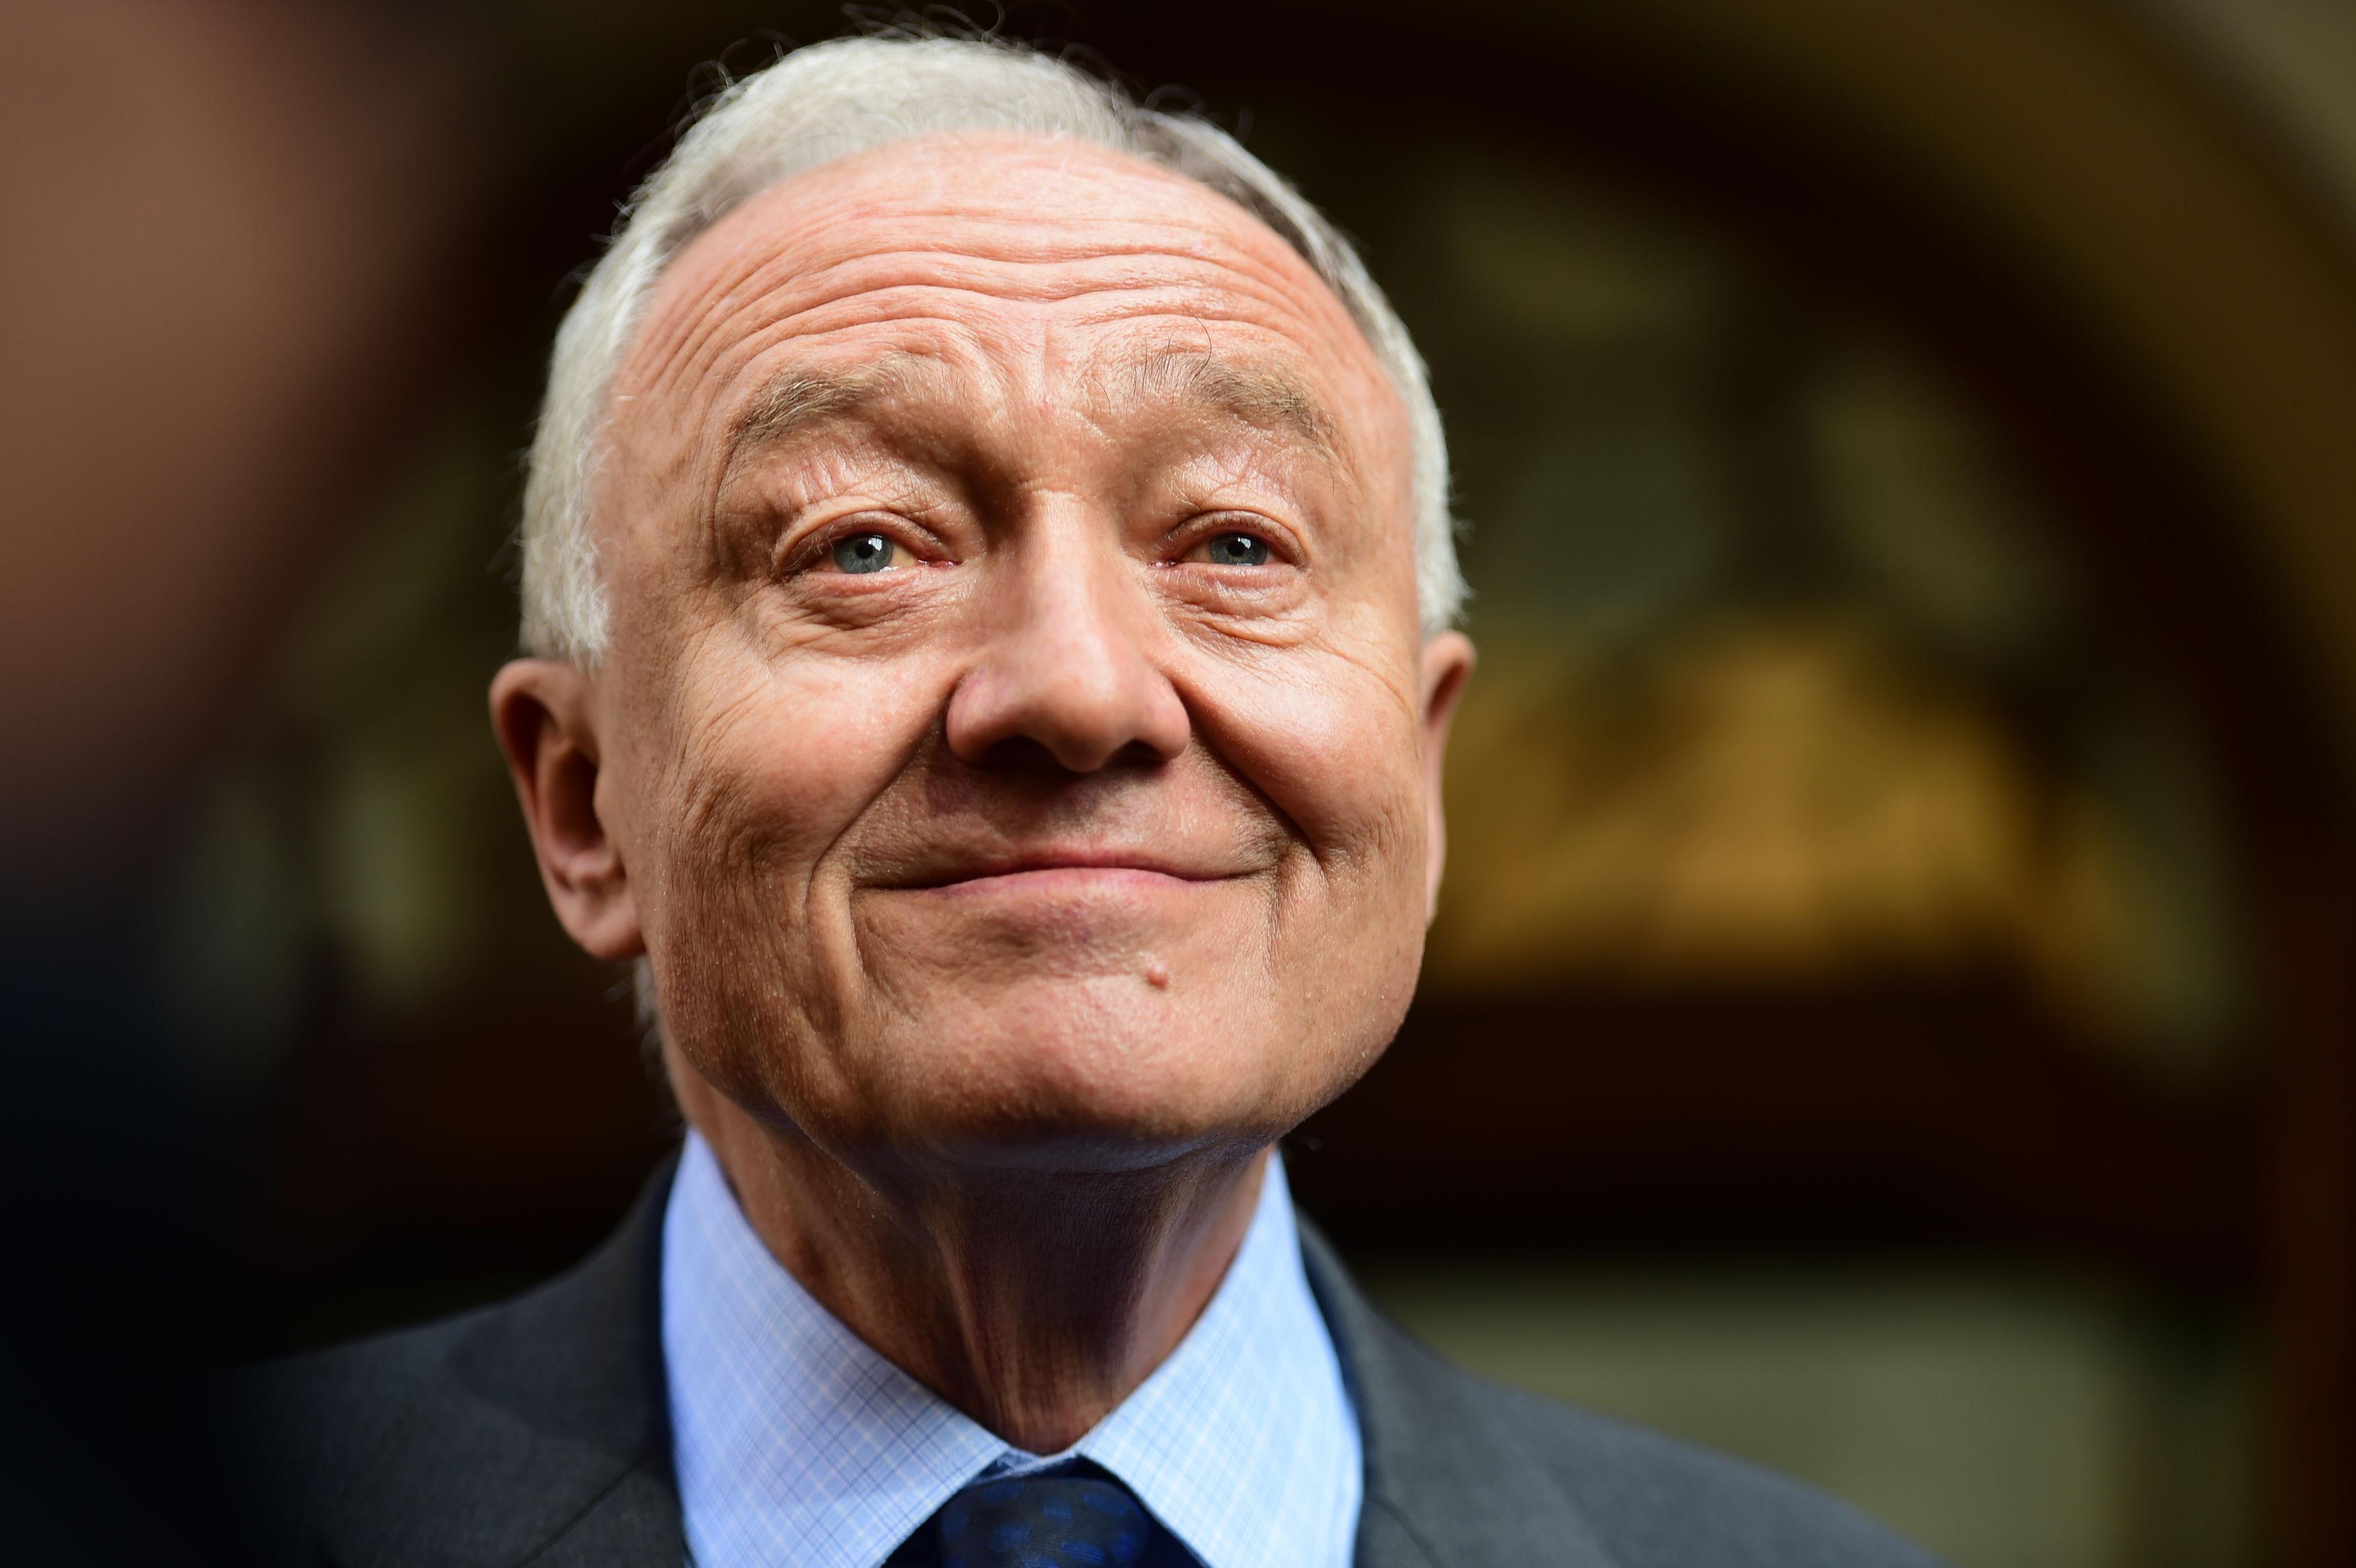 Livingstone barred indefinitely in new antisemitism row